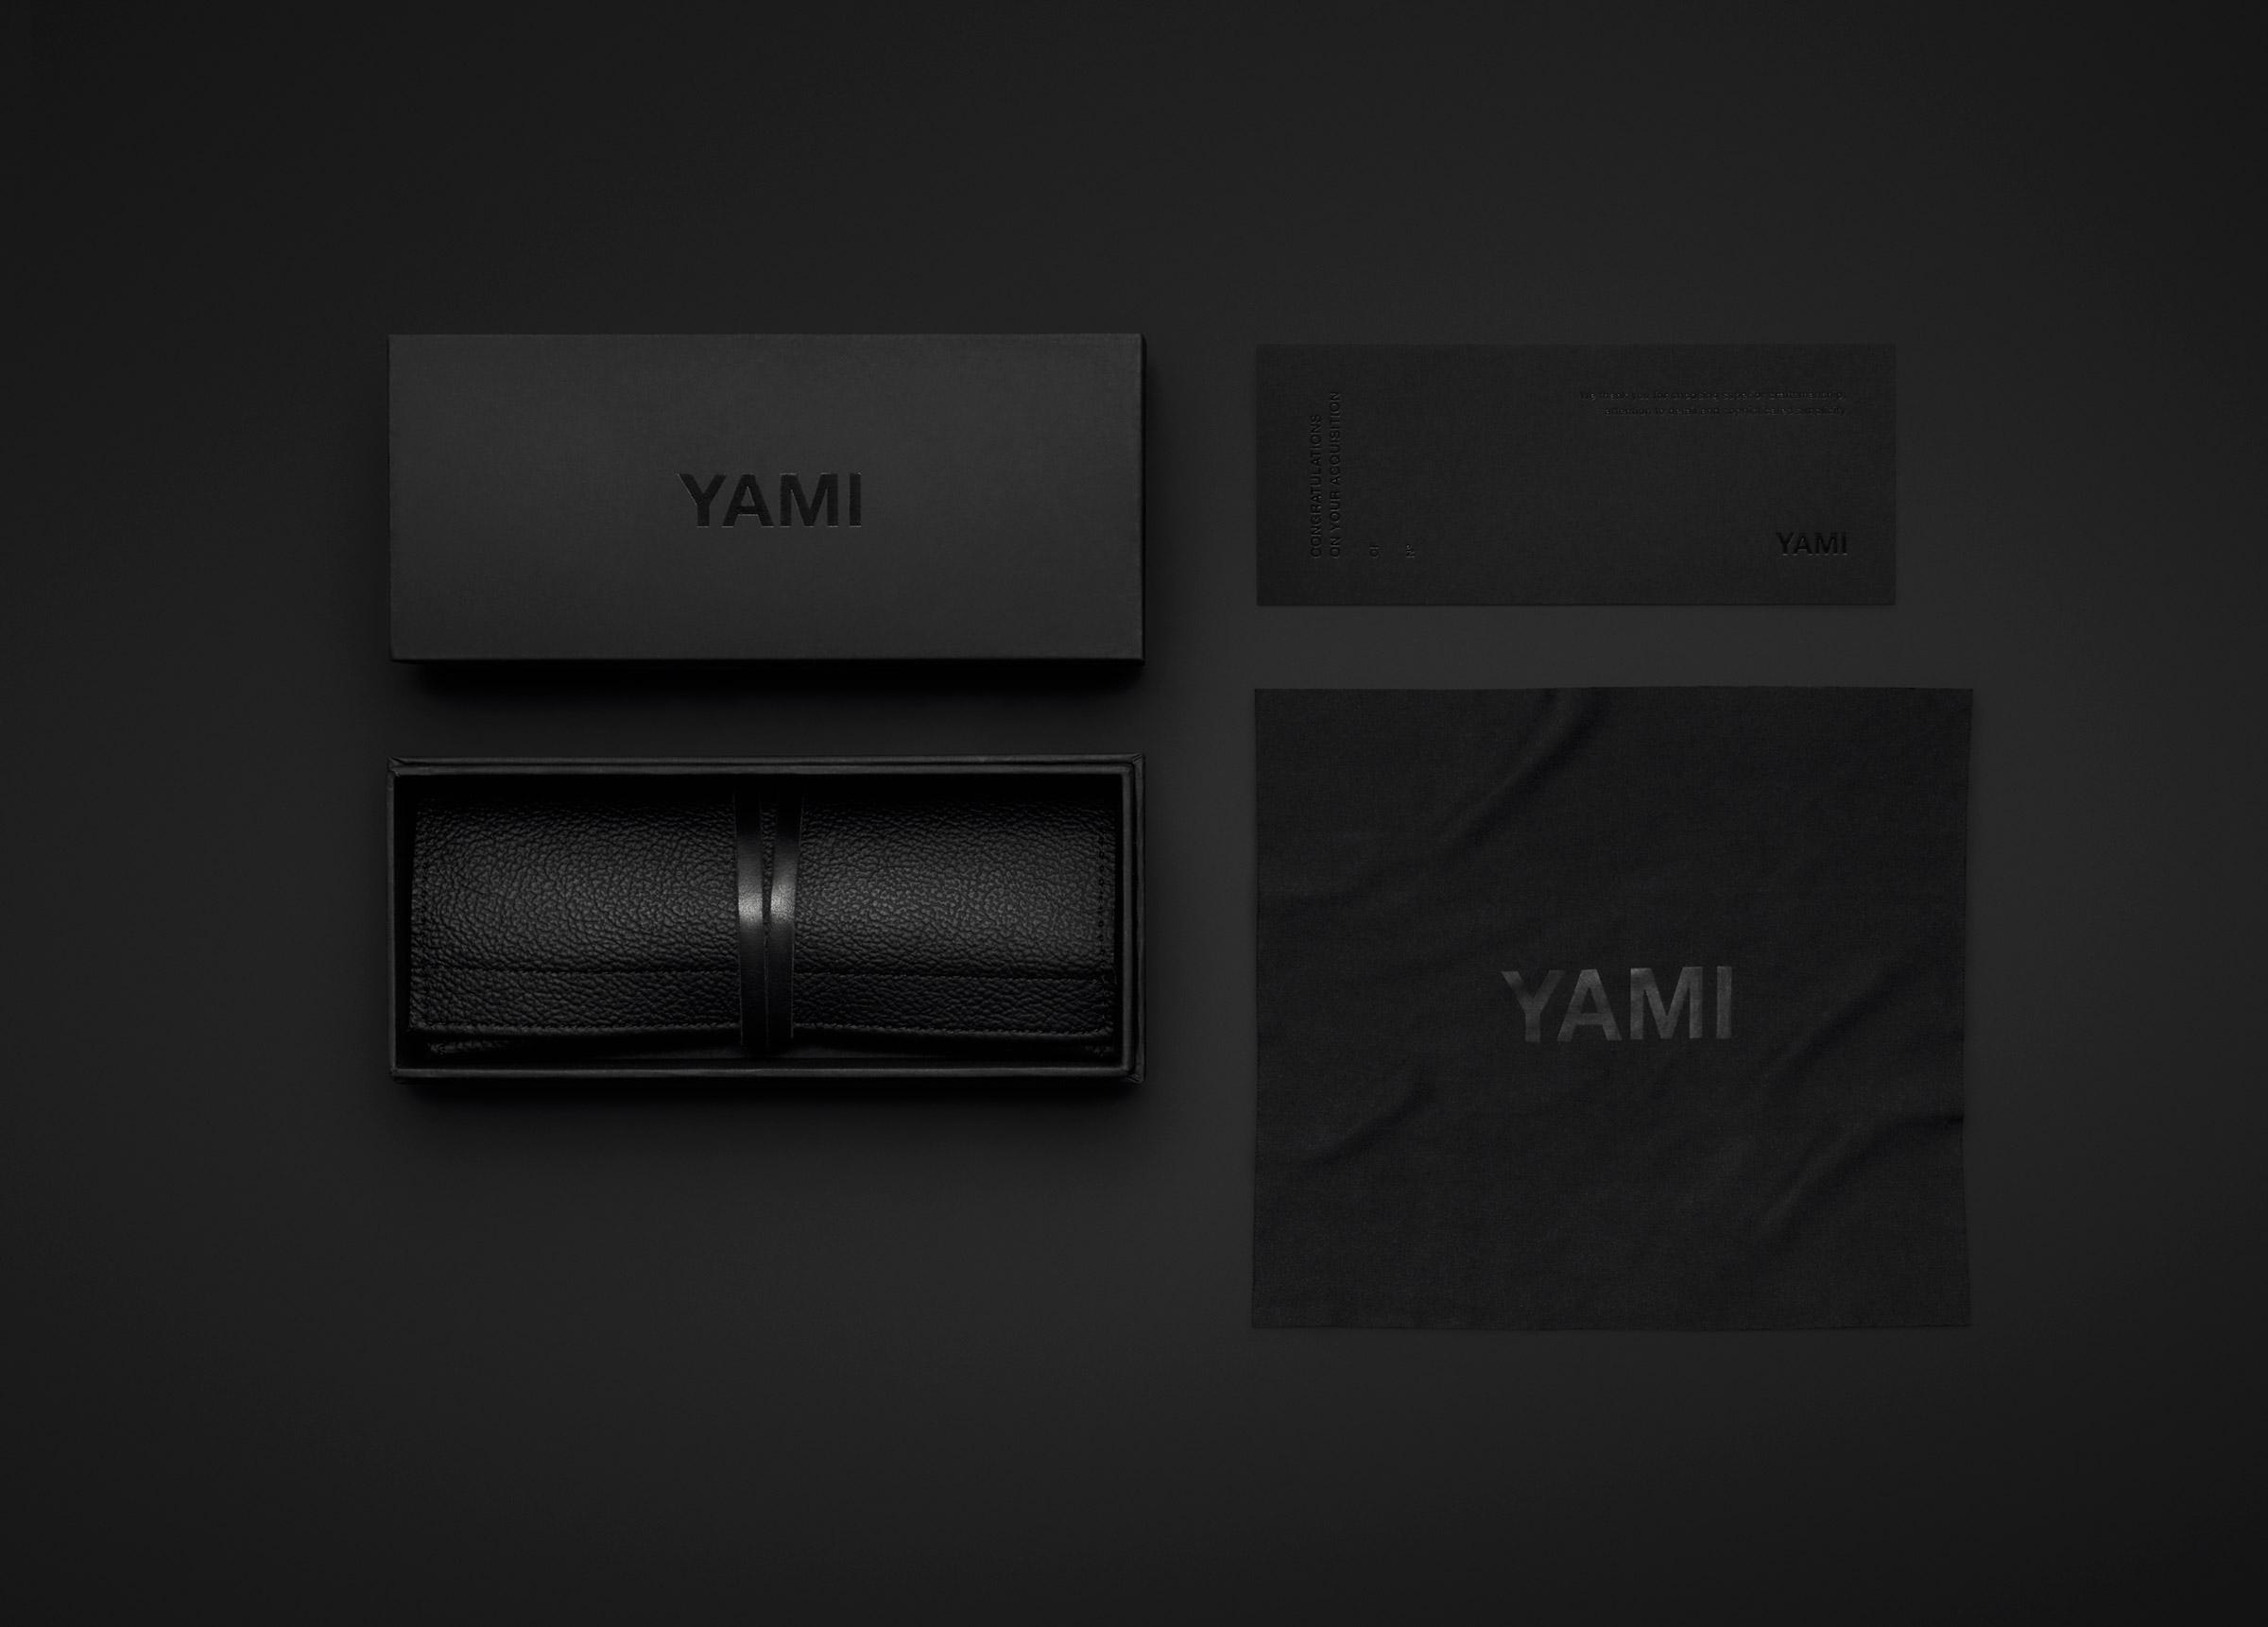 Yami_samlingsbild_3_MINT_LEV_WEB.jpg